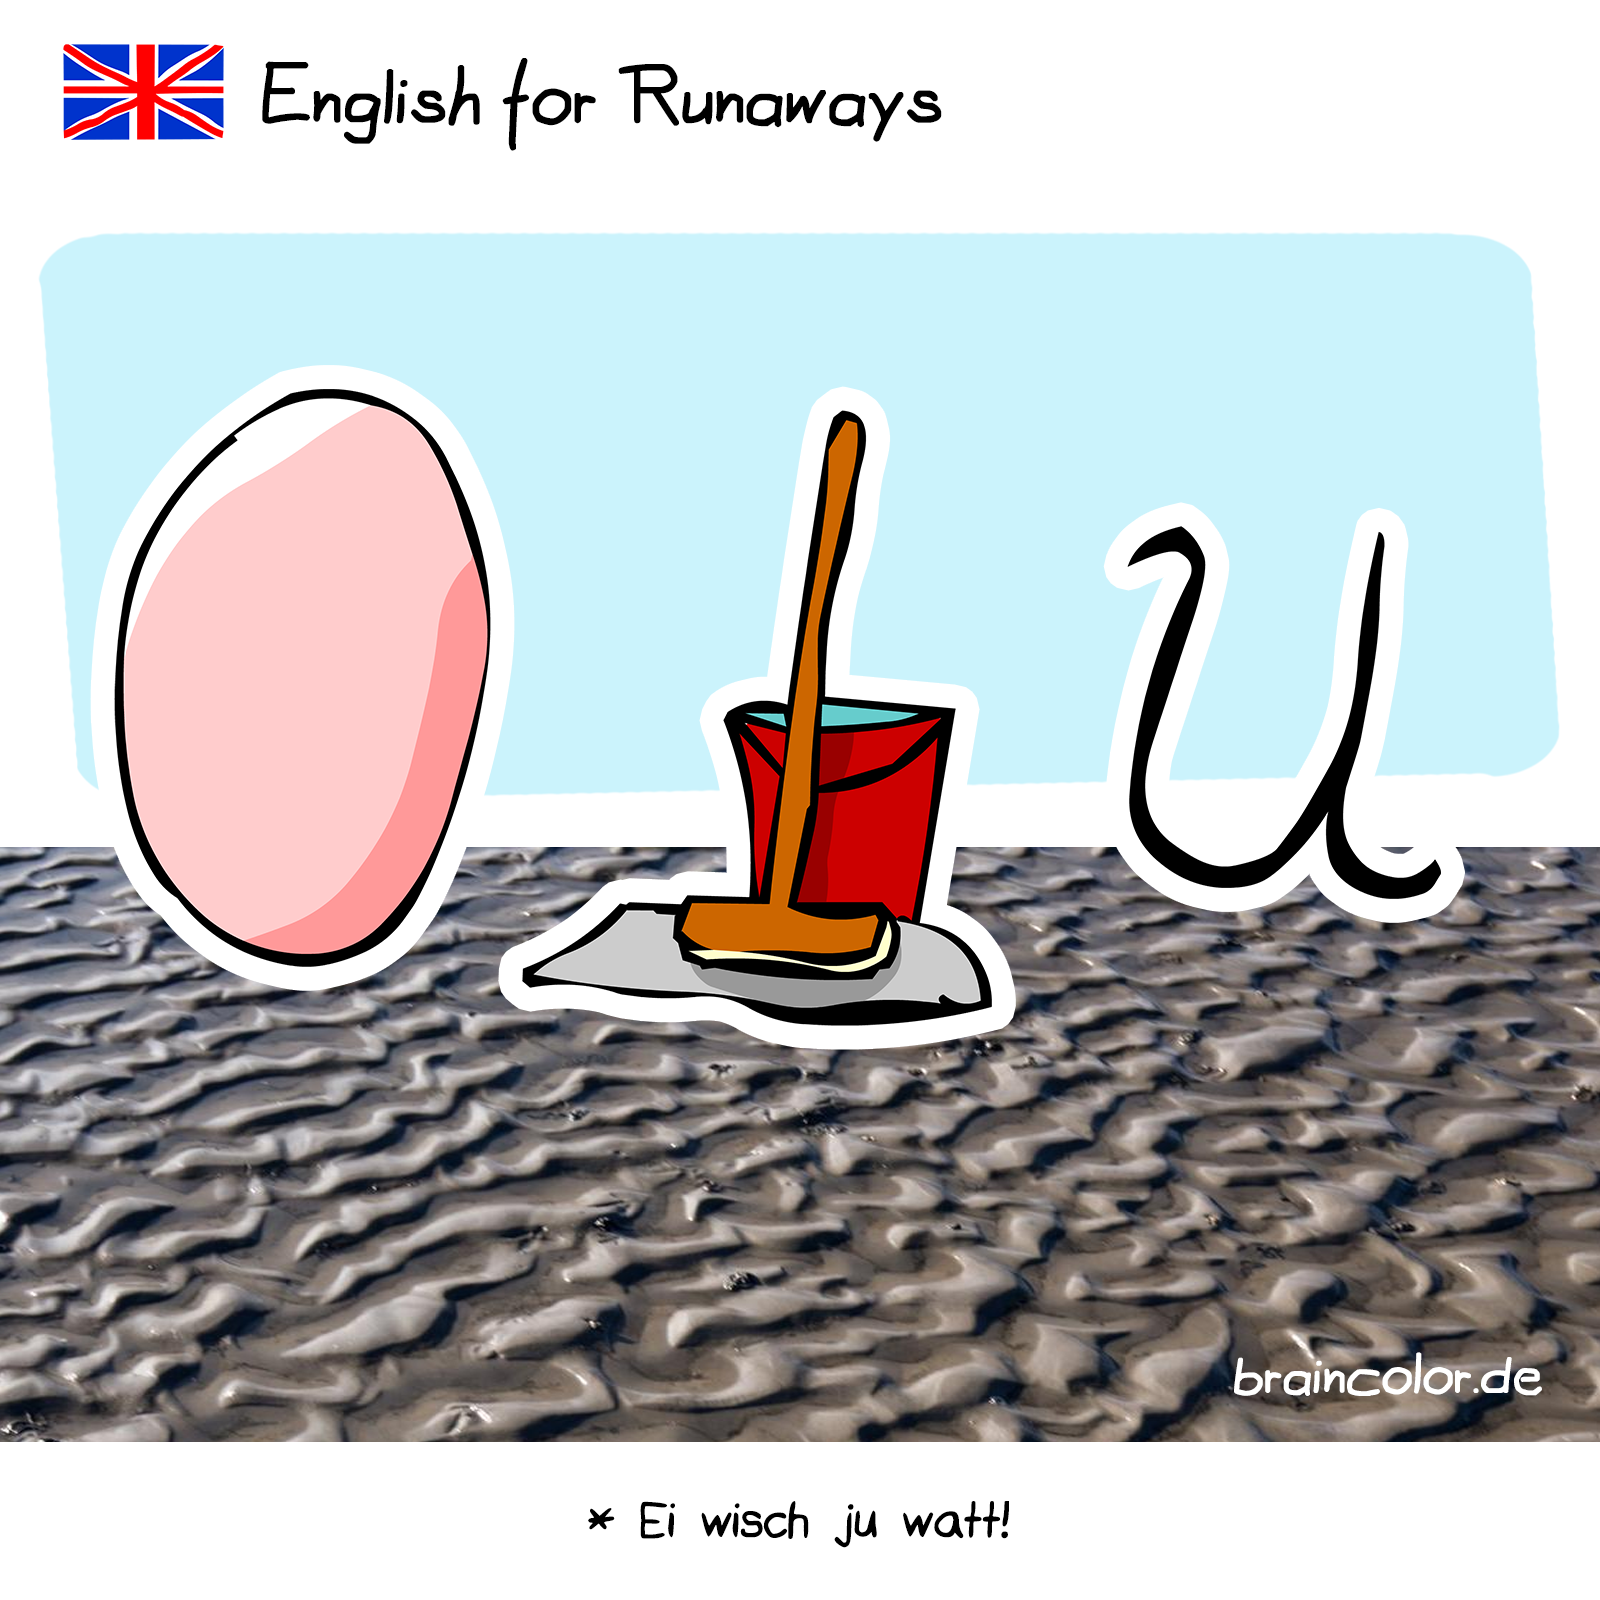 English for Runaways